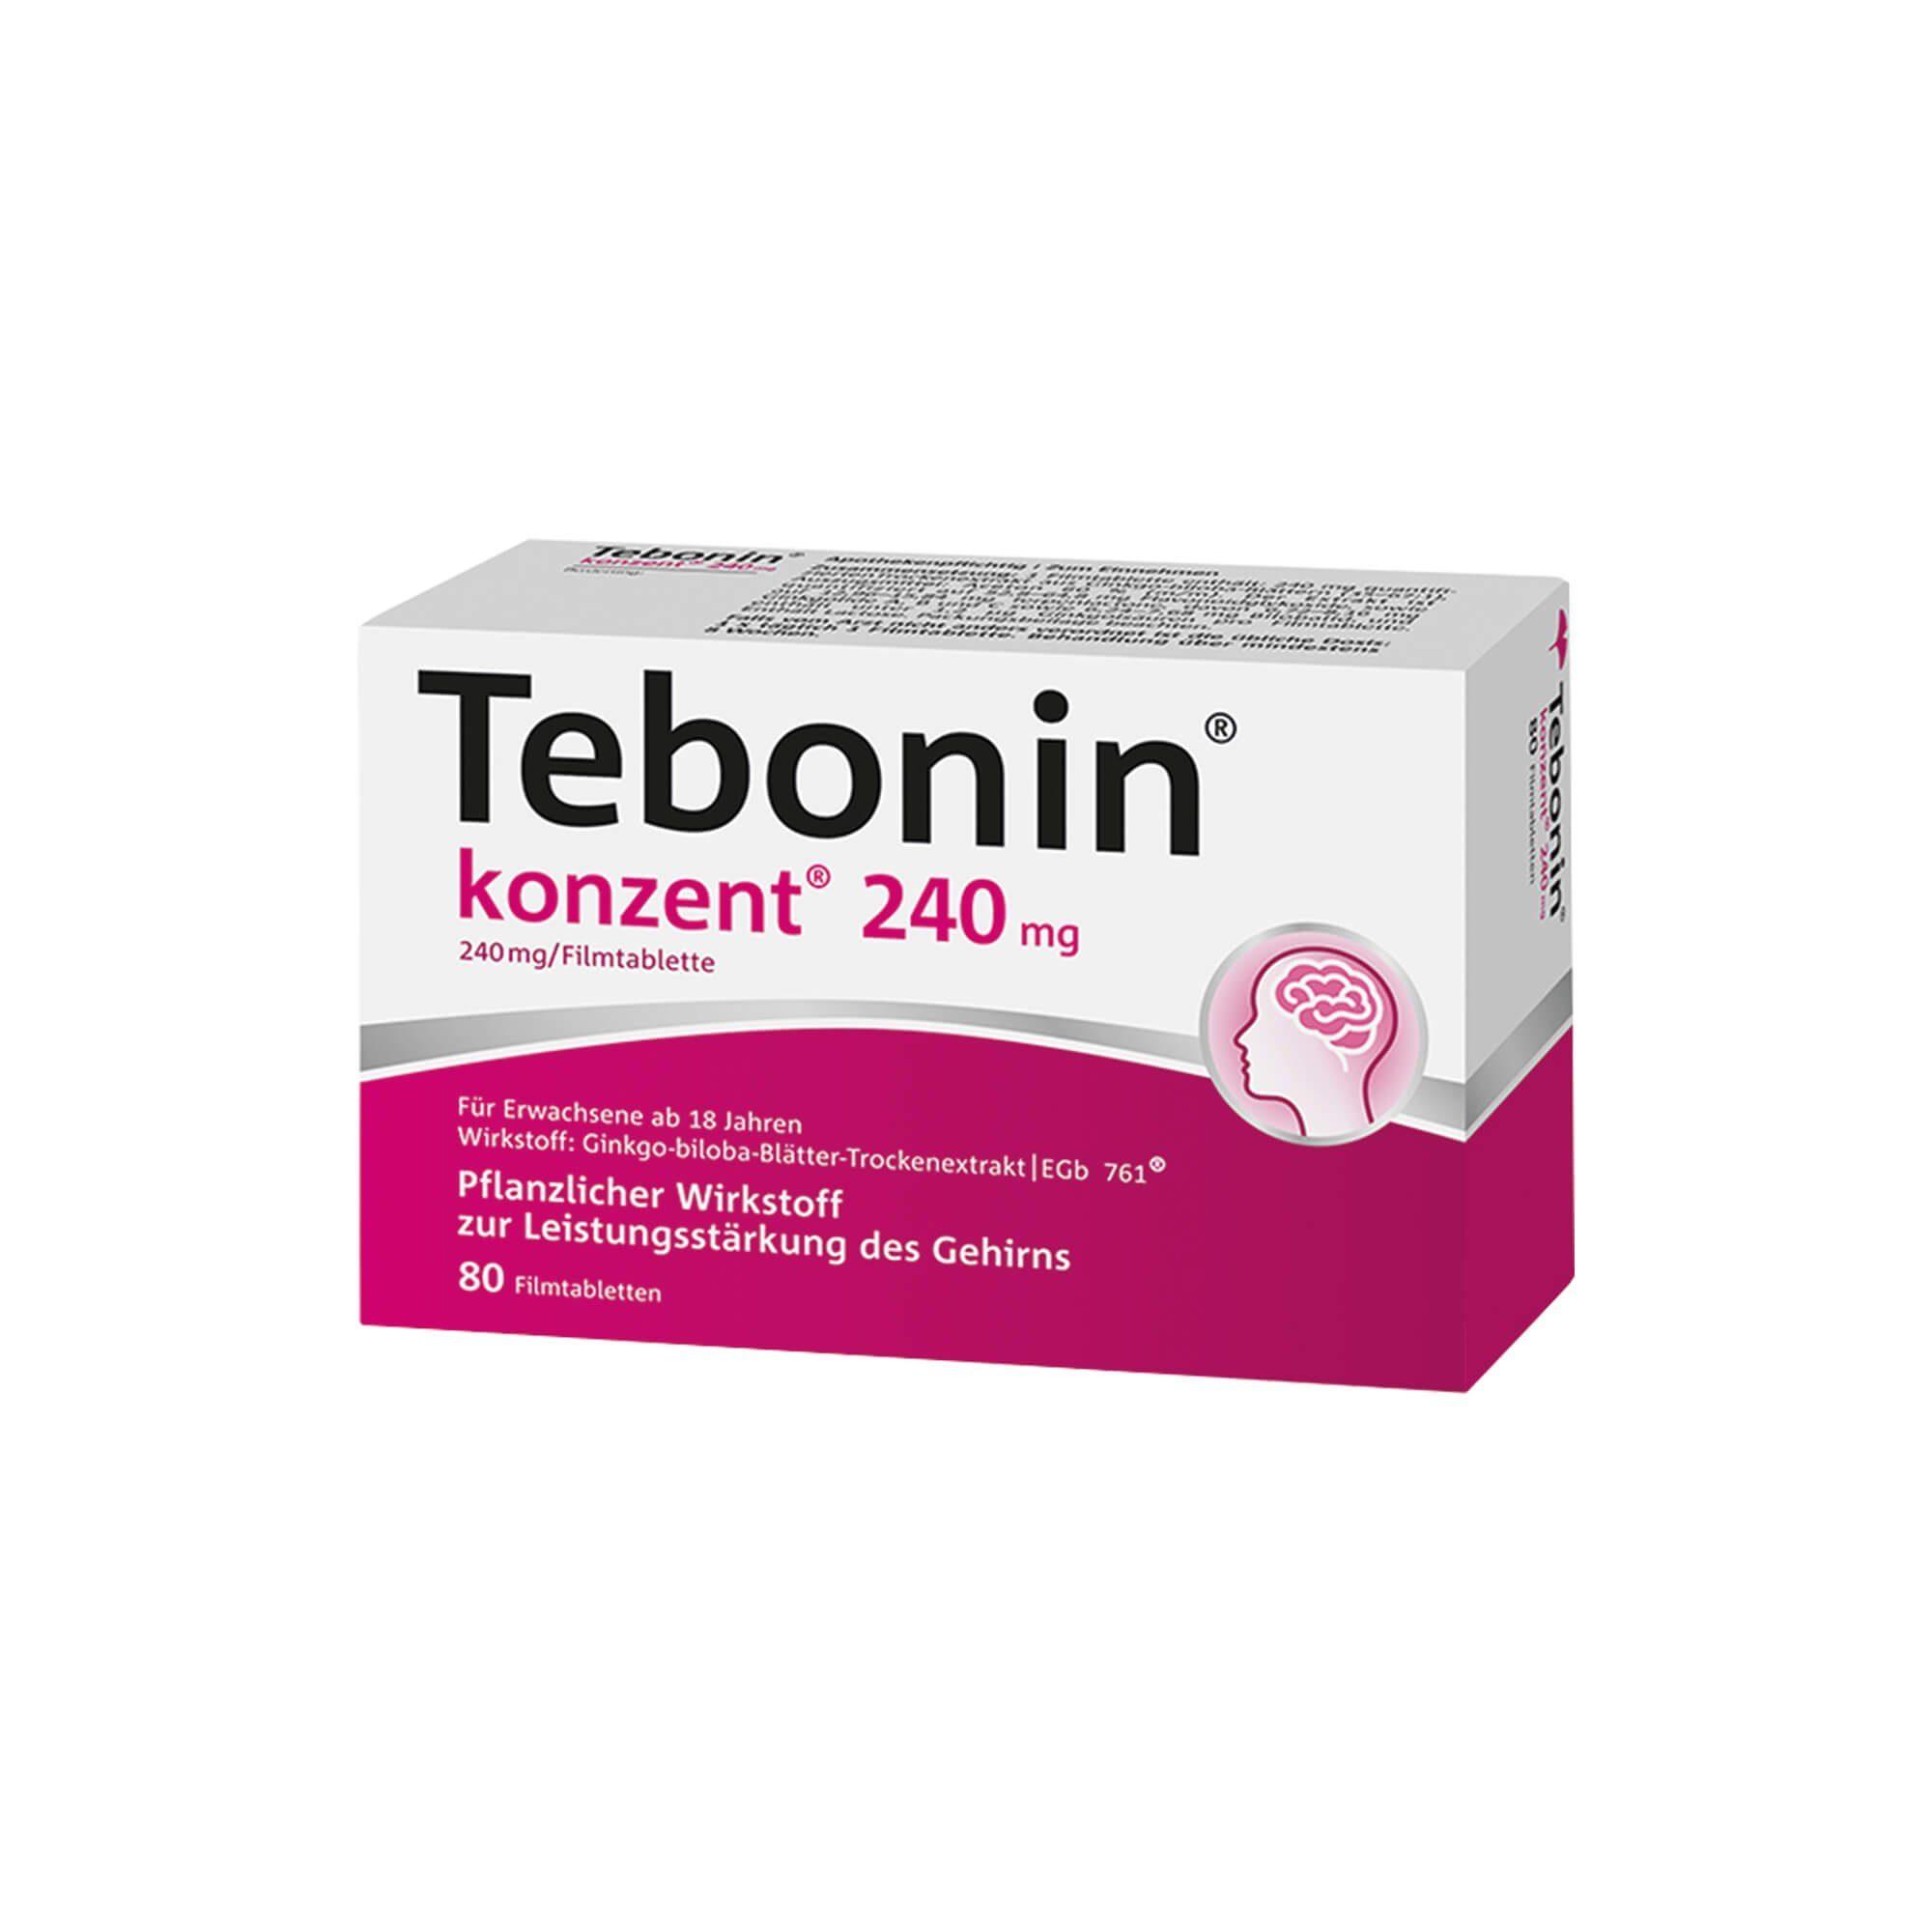 Tebonin konzent 240 mg , 80 St